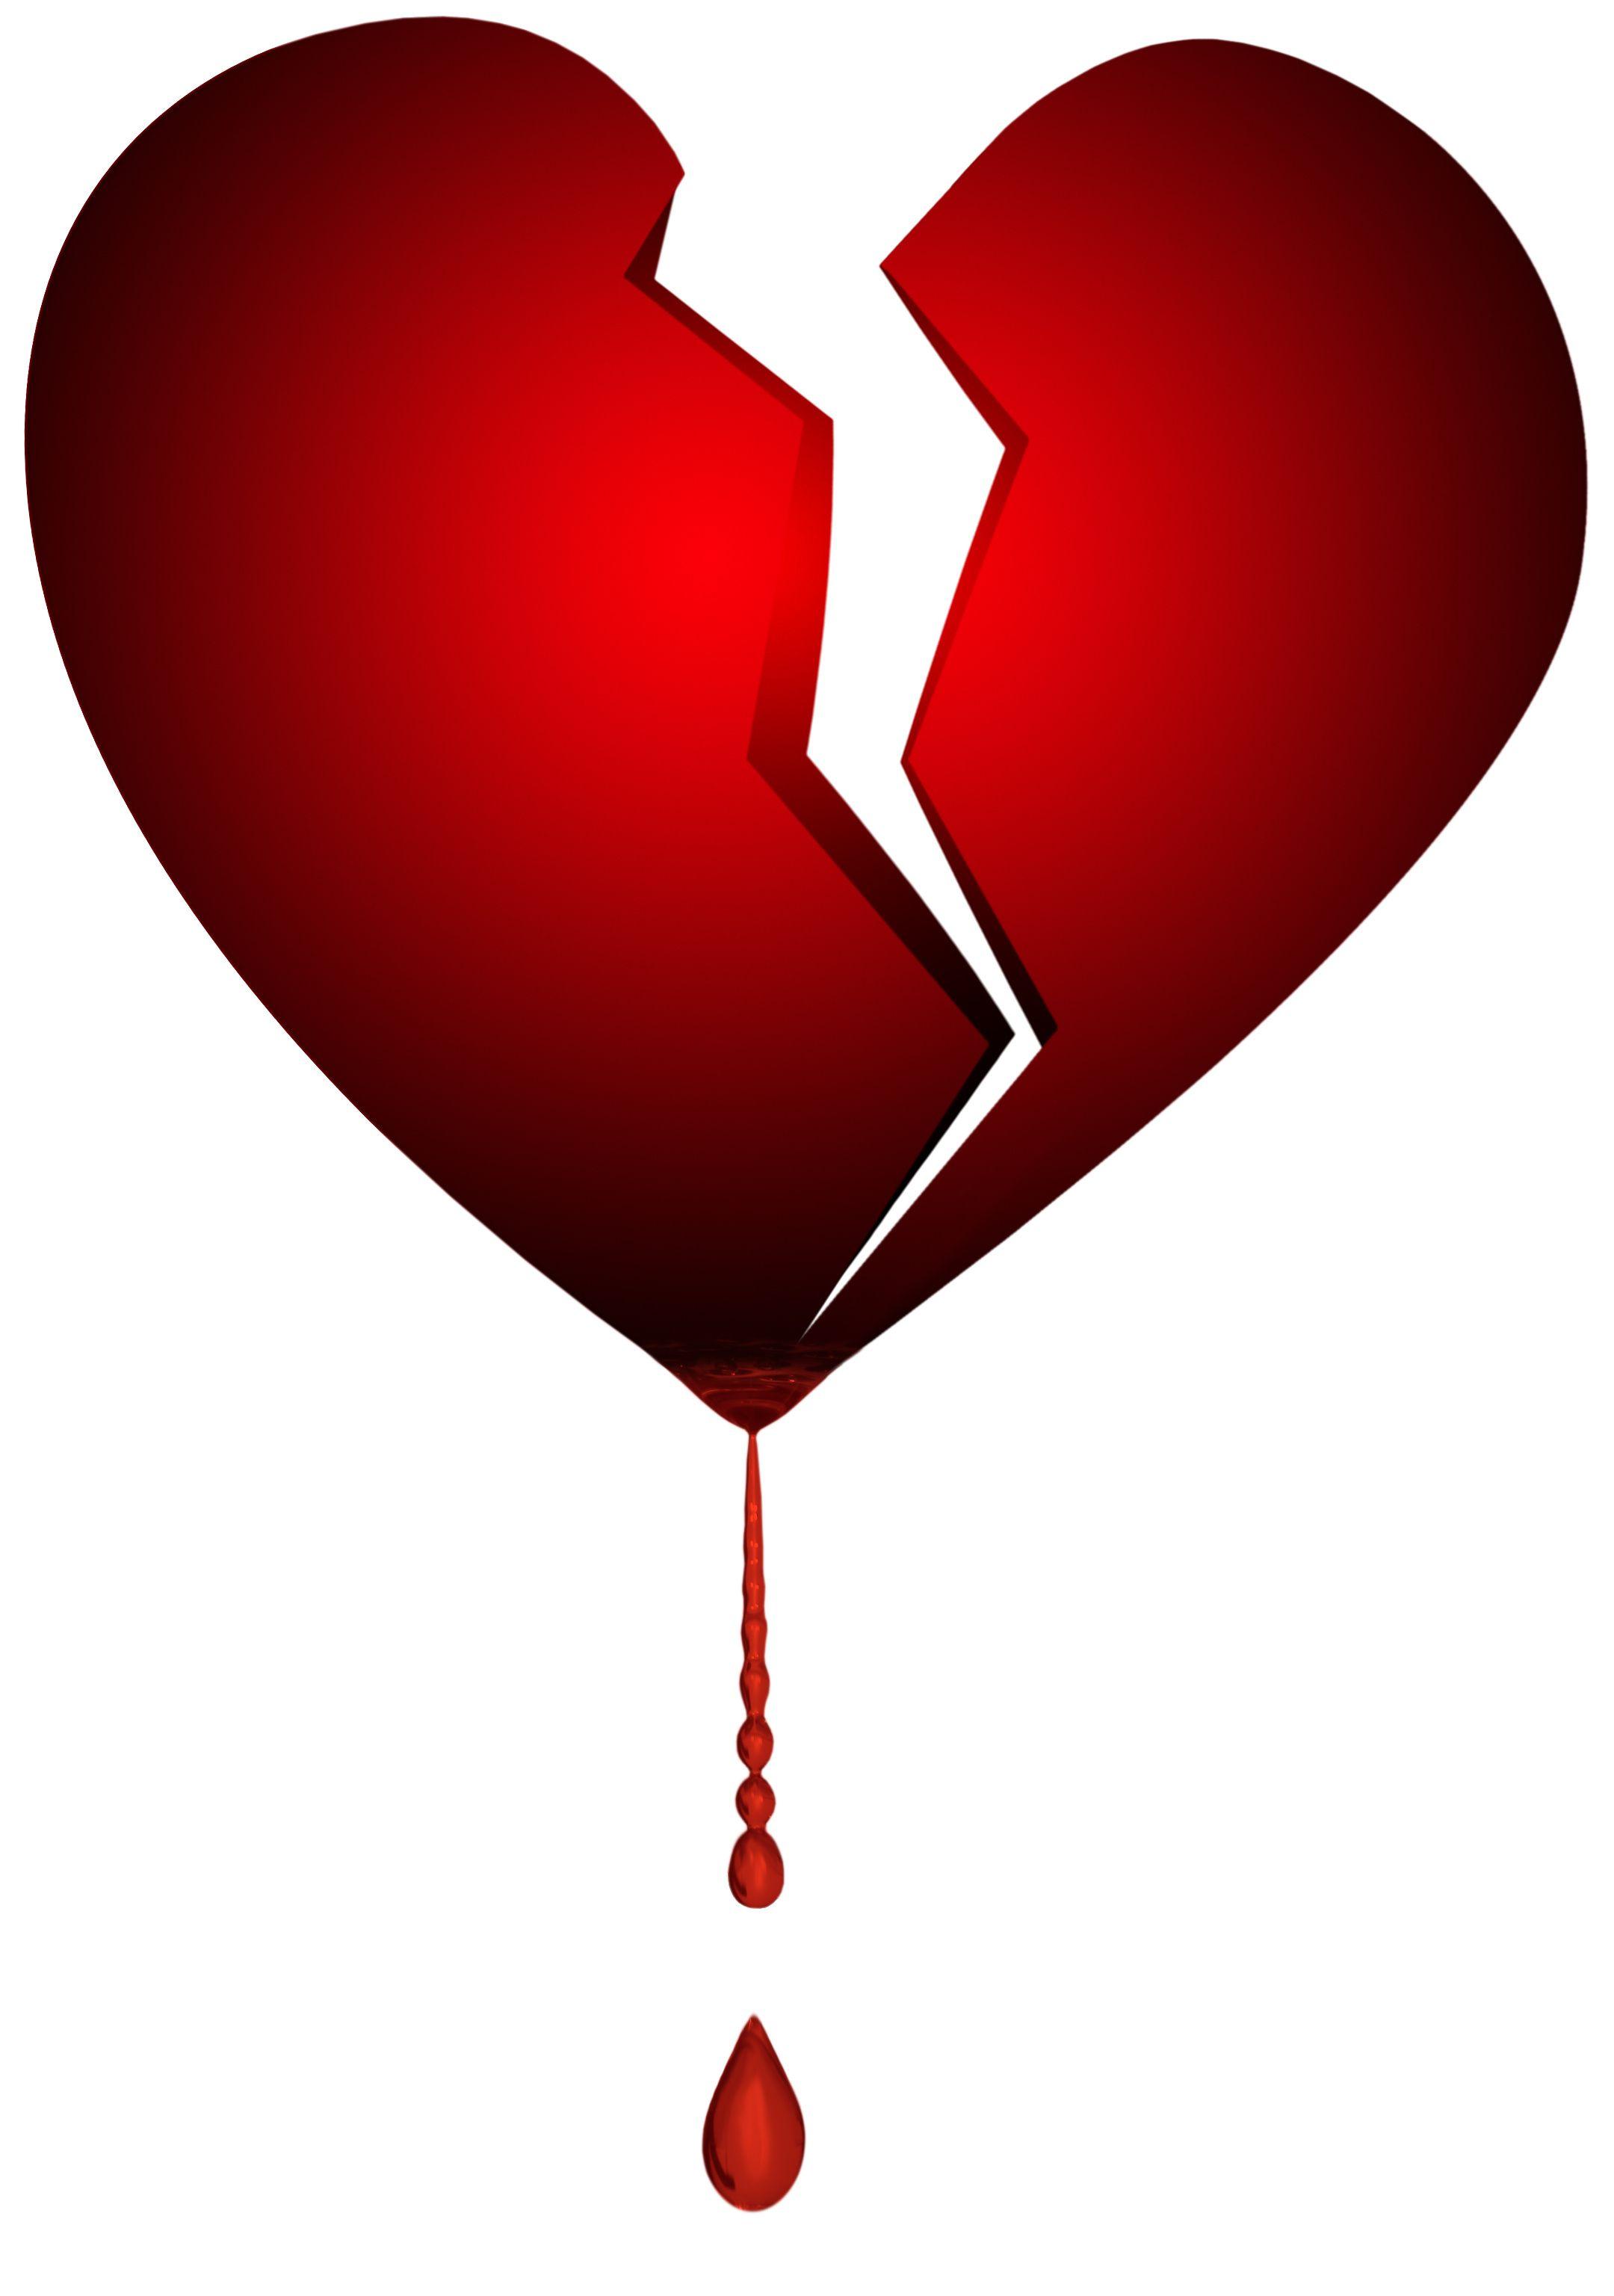 Download the After Breakup eBook Online LoveAndGifts